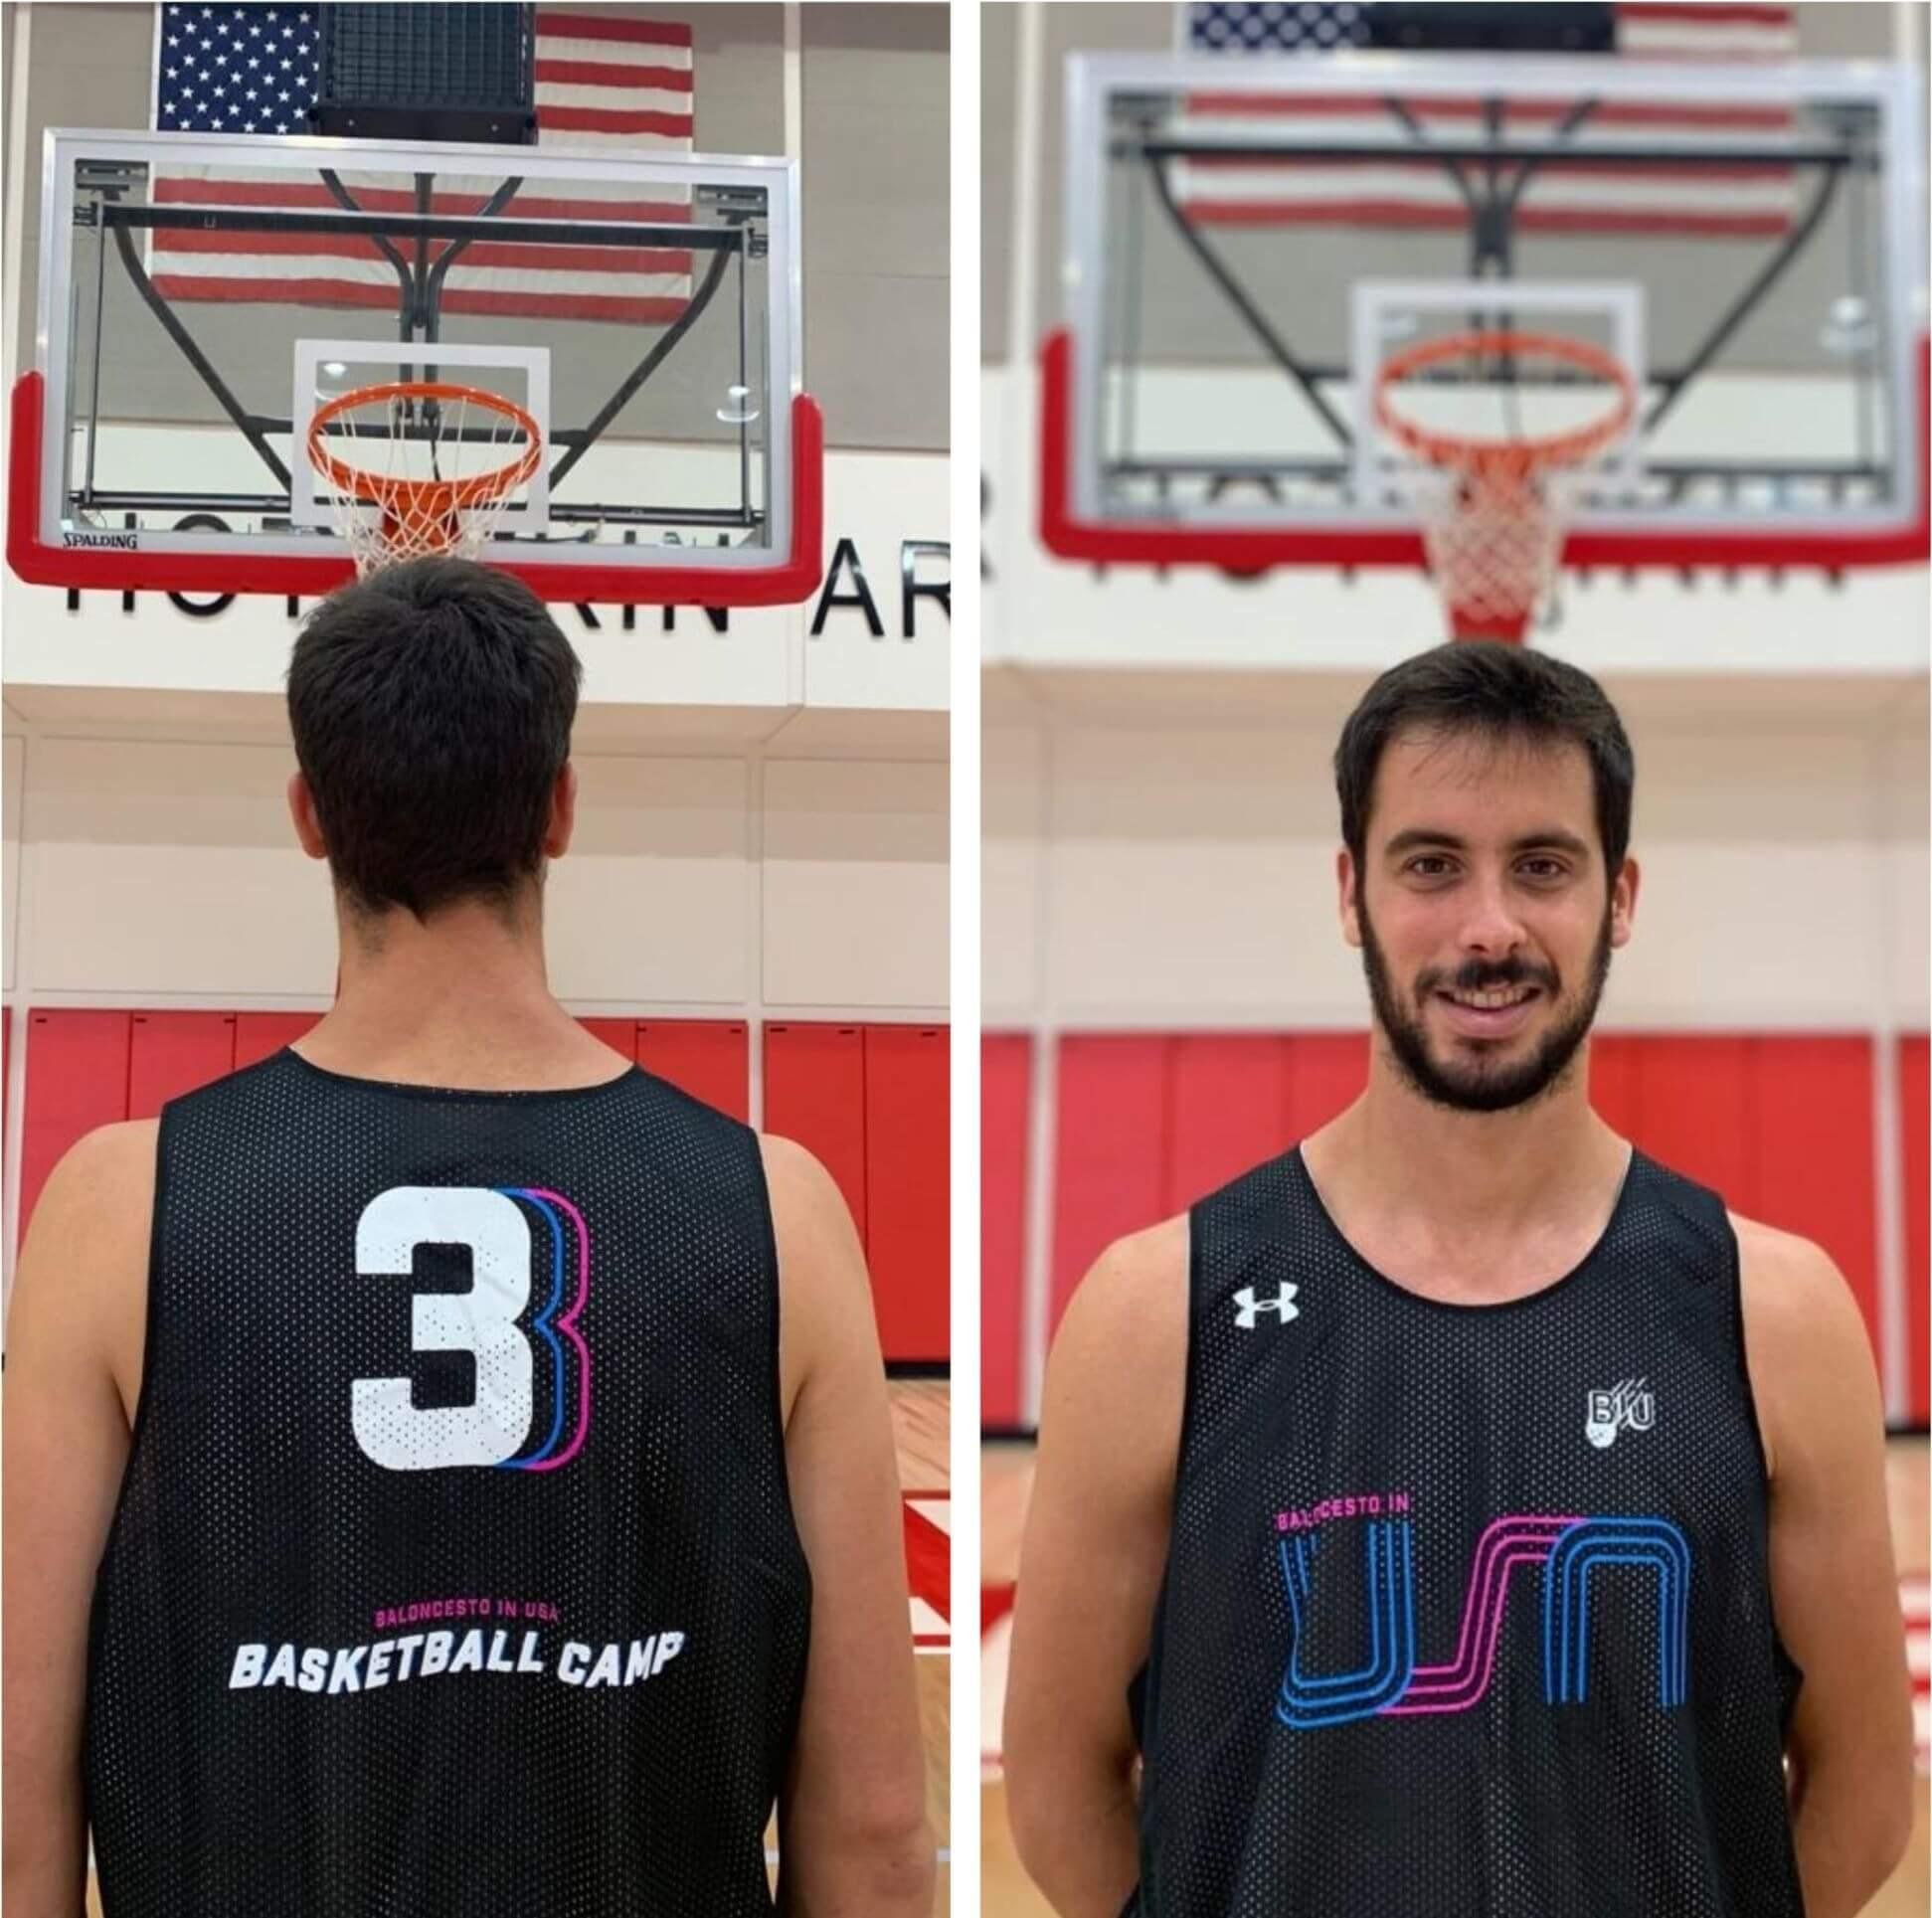 Camiseta de baloncesto BIU